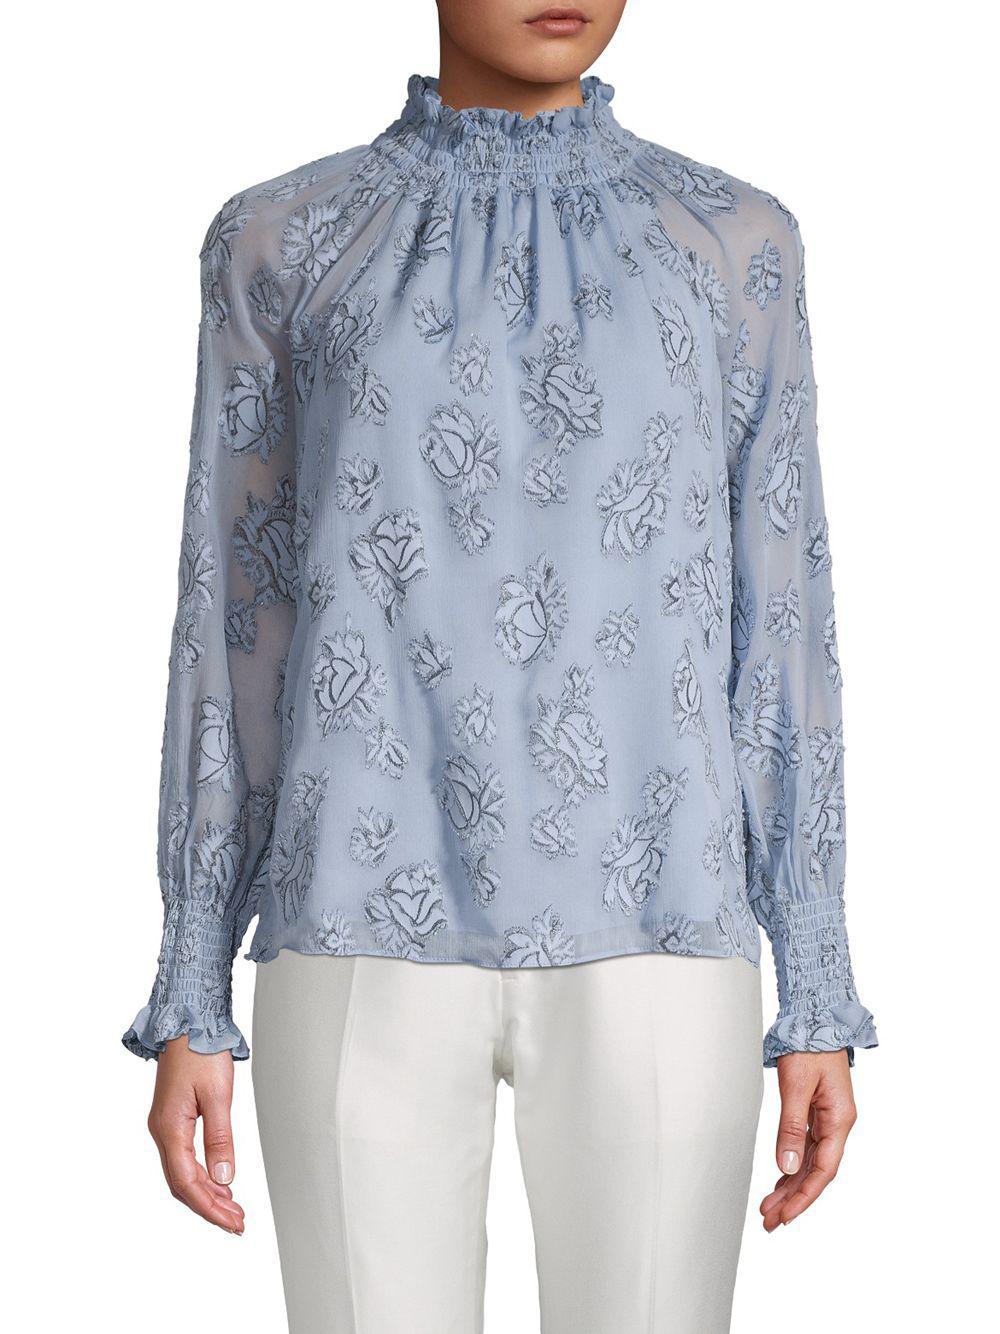 1d9b10c3d5228a Lyst - Rebecca Taylor Mockneck Long Sleeve Floral Top in Blue - Save 58%